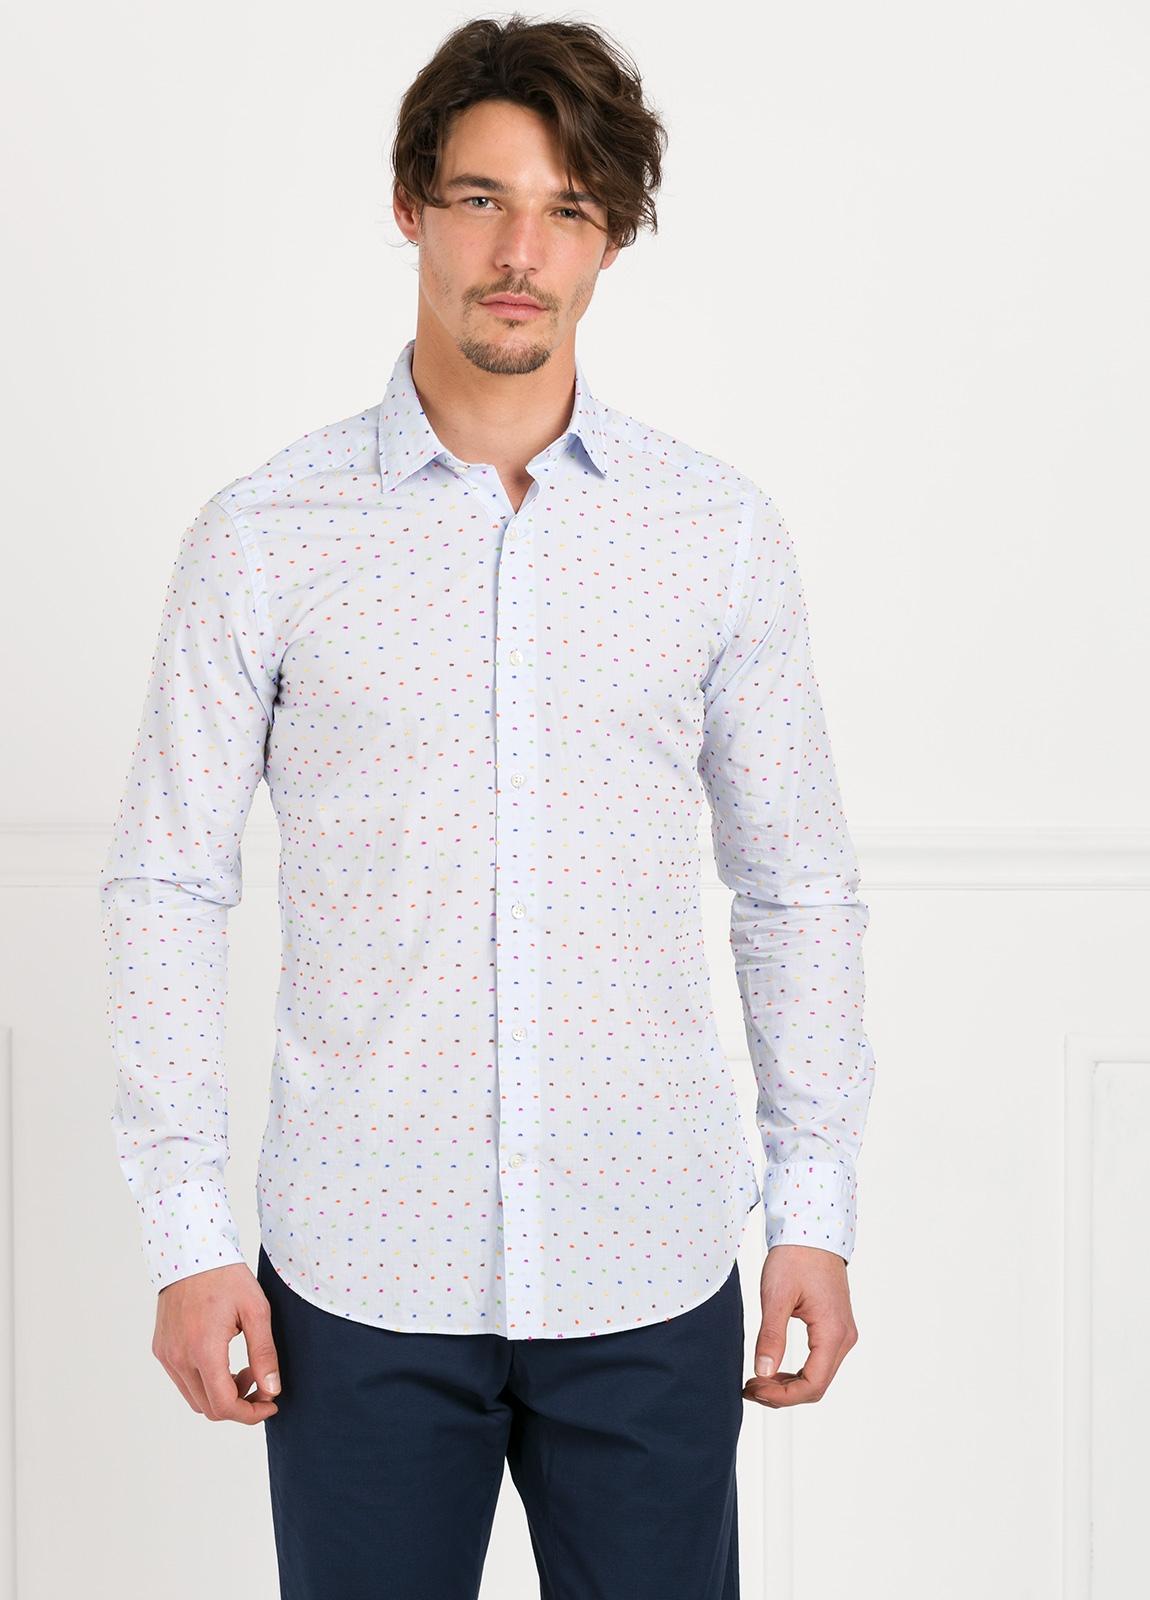 Camisa Leisure Wear SLIM FIT modelo PORTO color blanco estampado fantasia. 100% Algodón. - Ítem2